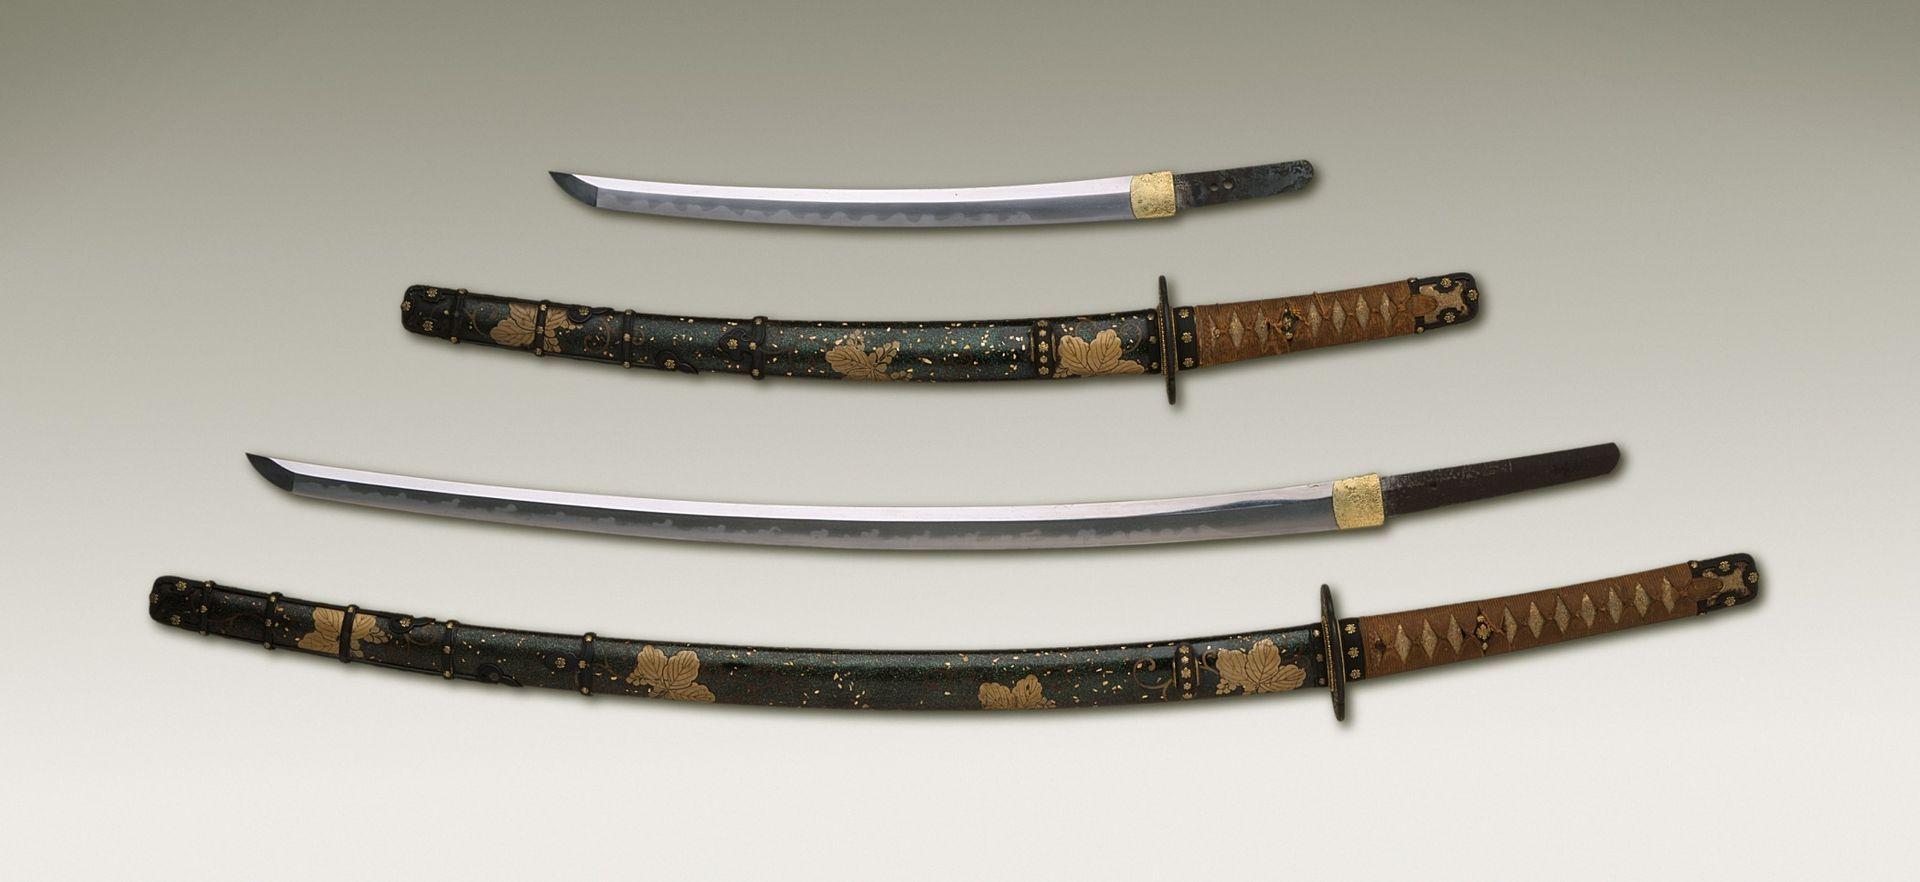 Katana Wikipedia Japanese Sword Long Sword Samurai Weapons